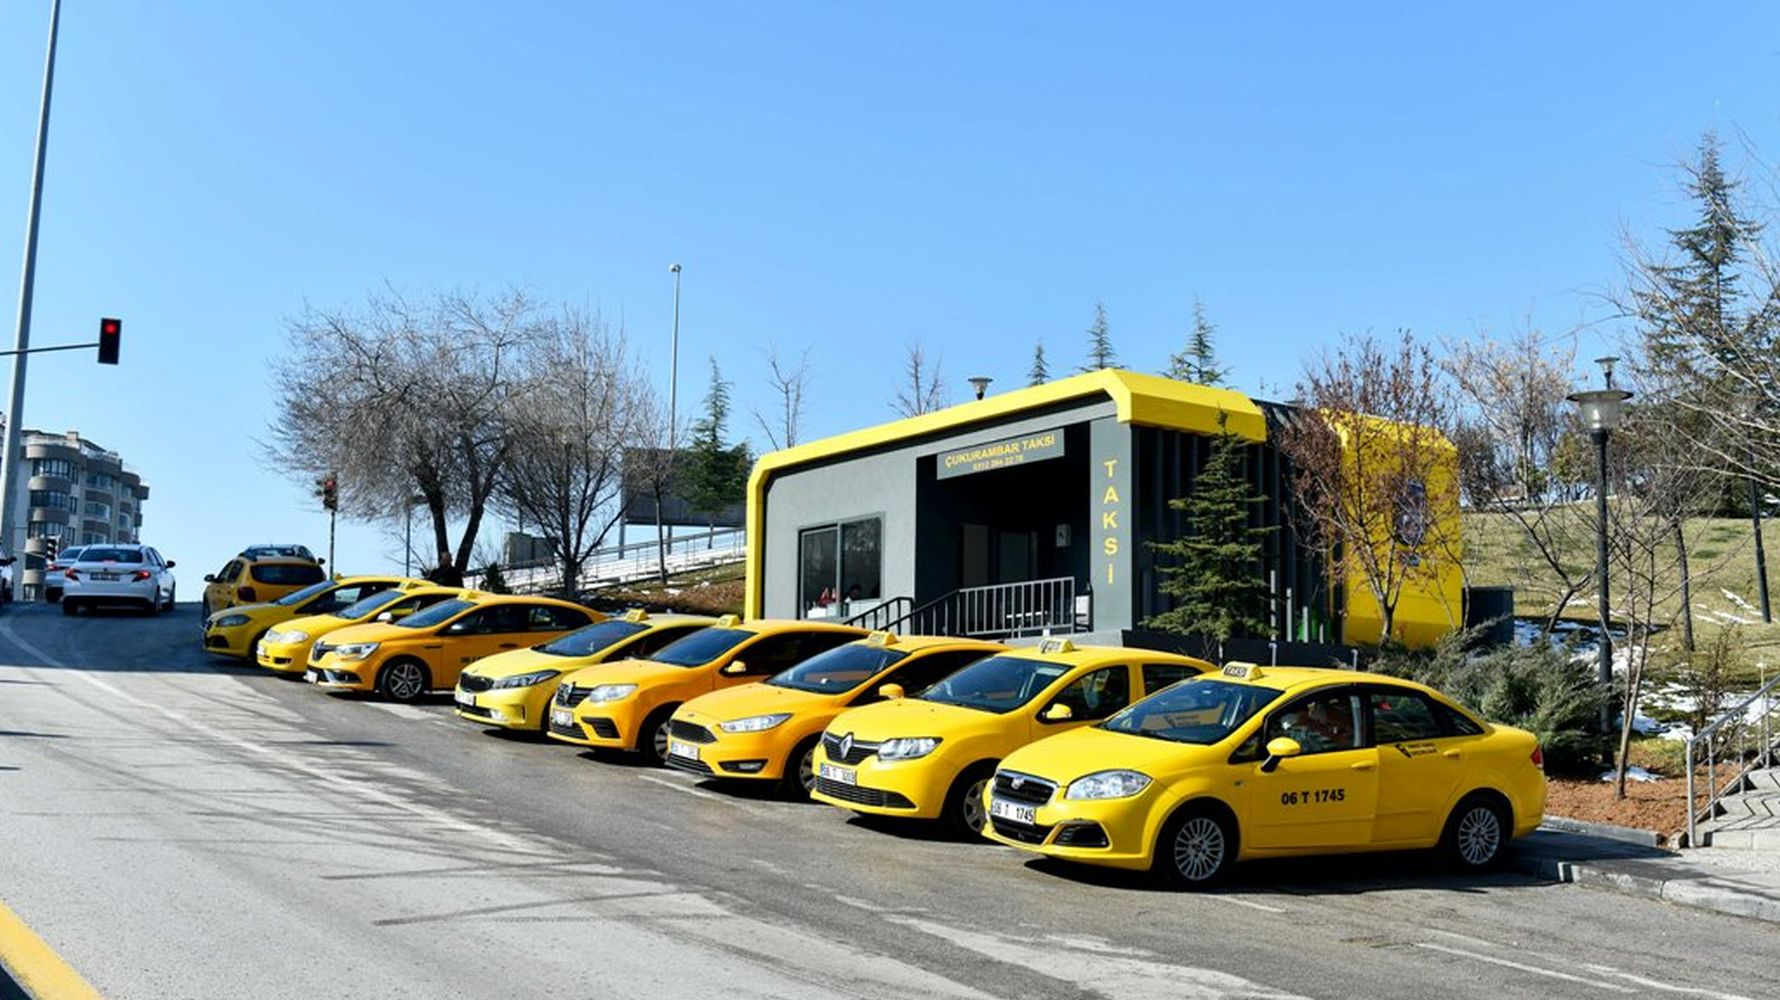 cukurambar was the first application address of modern taxi stands in Ankara